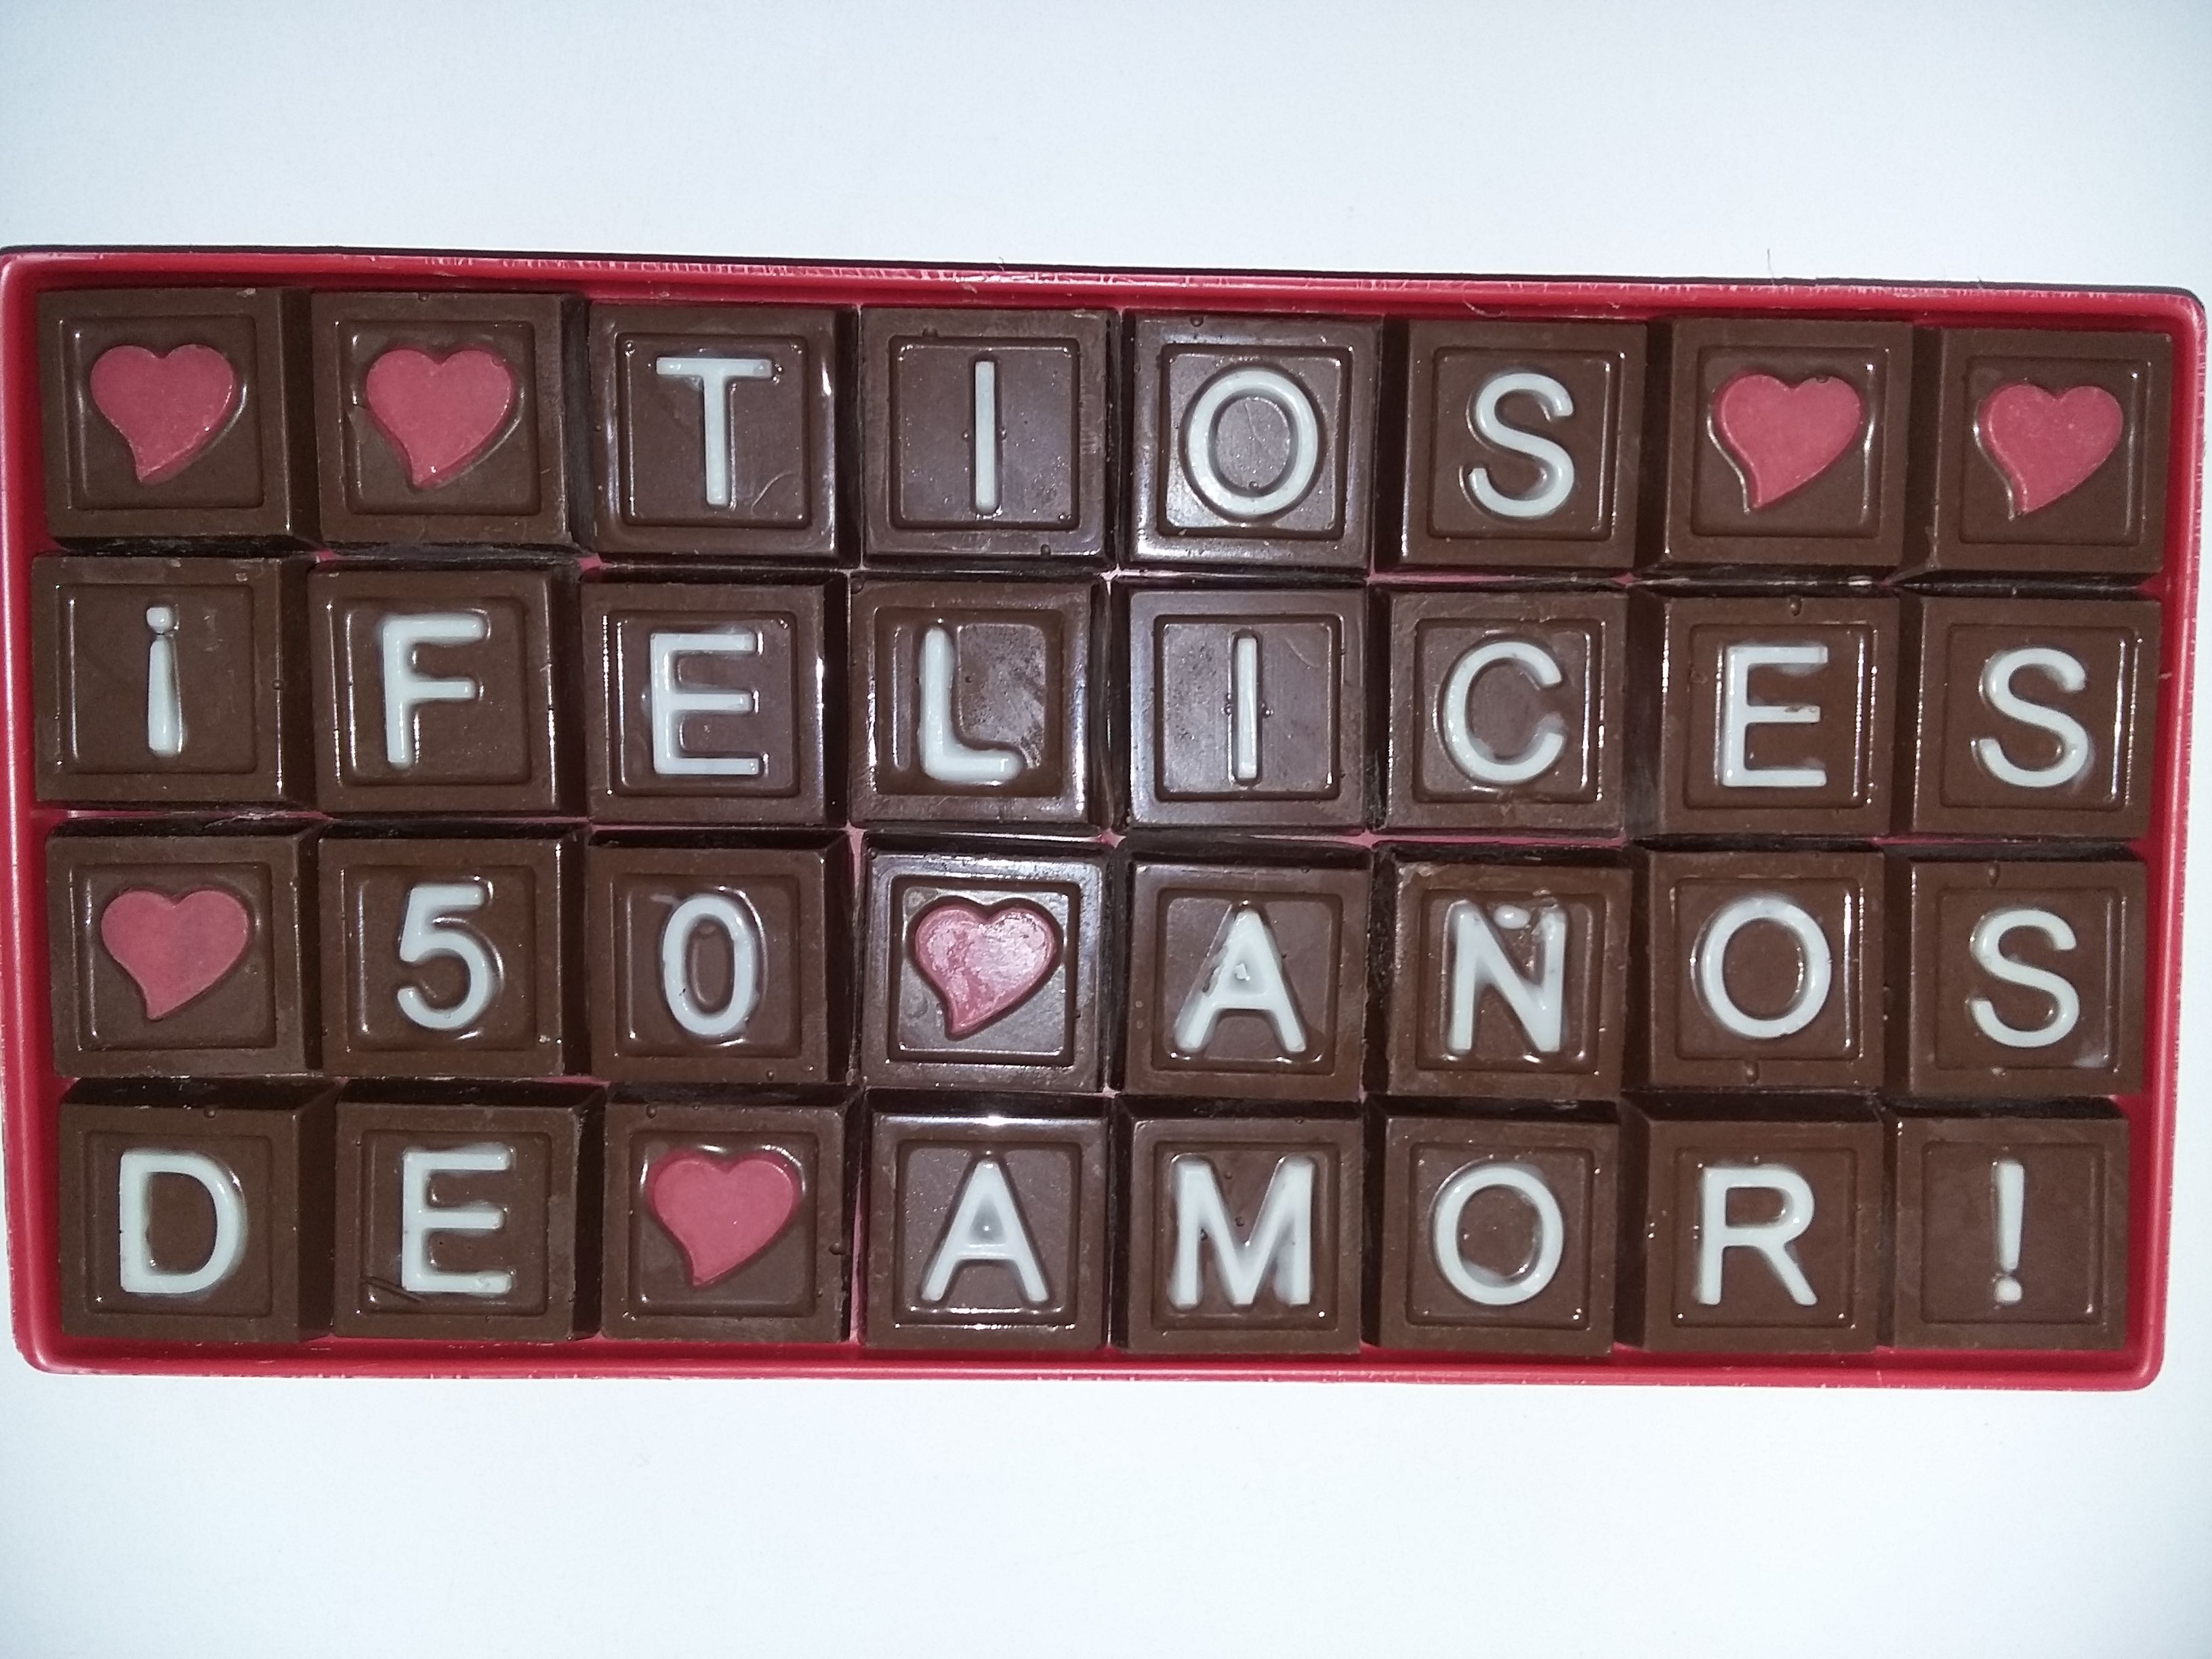 mensaje de chocolate o chocomensaje de saludo www.palermodulce.com,ar